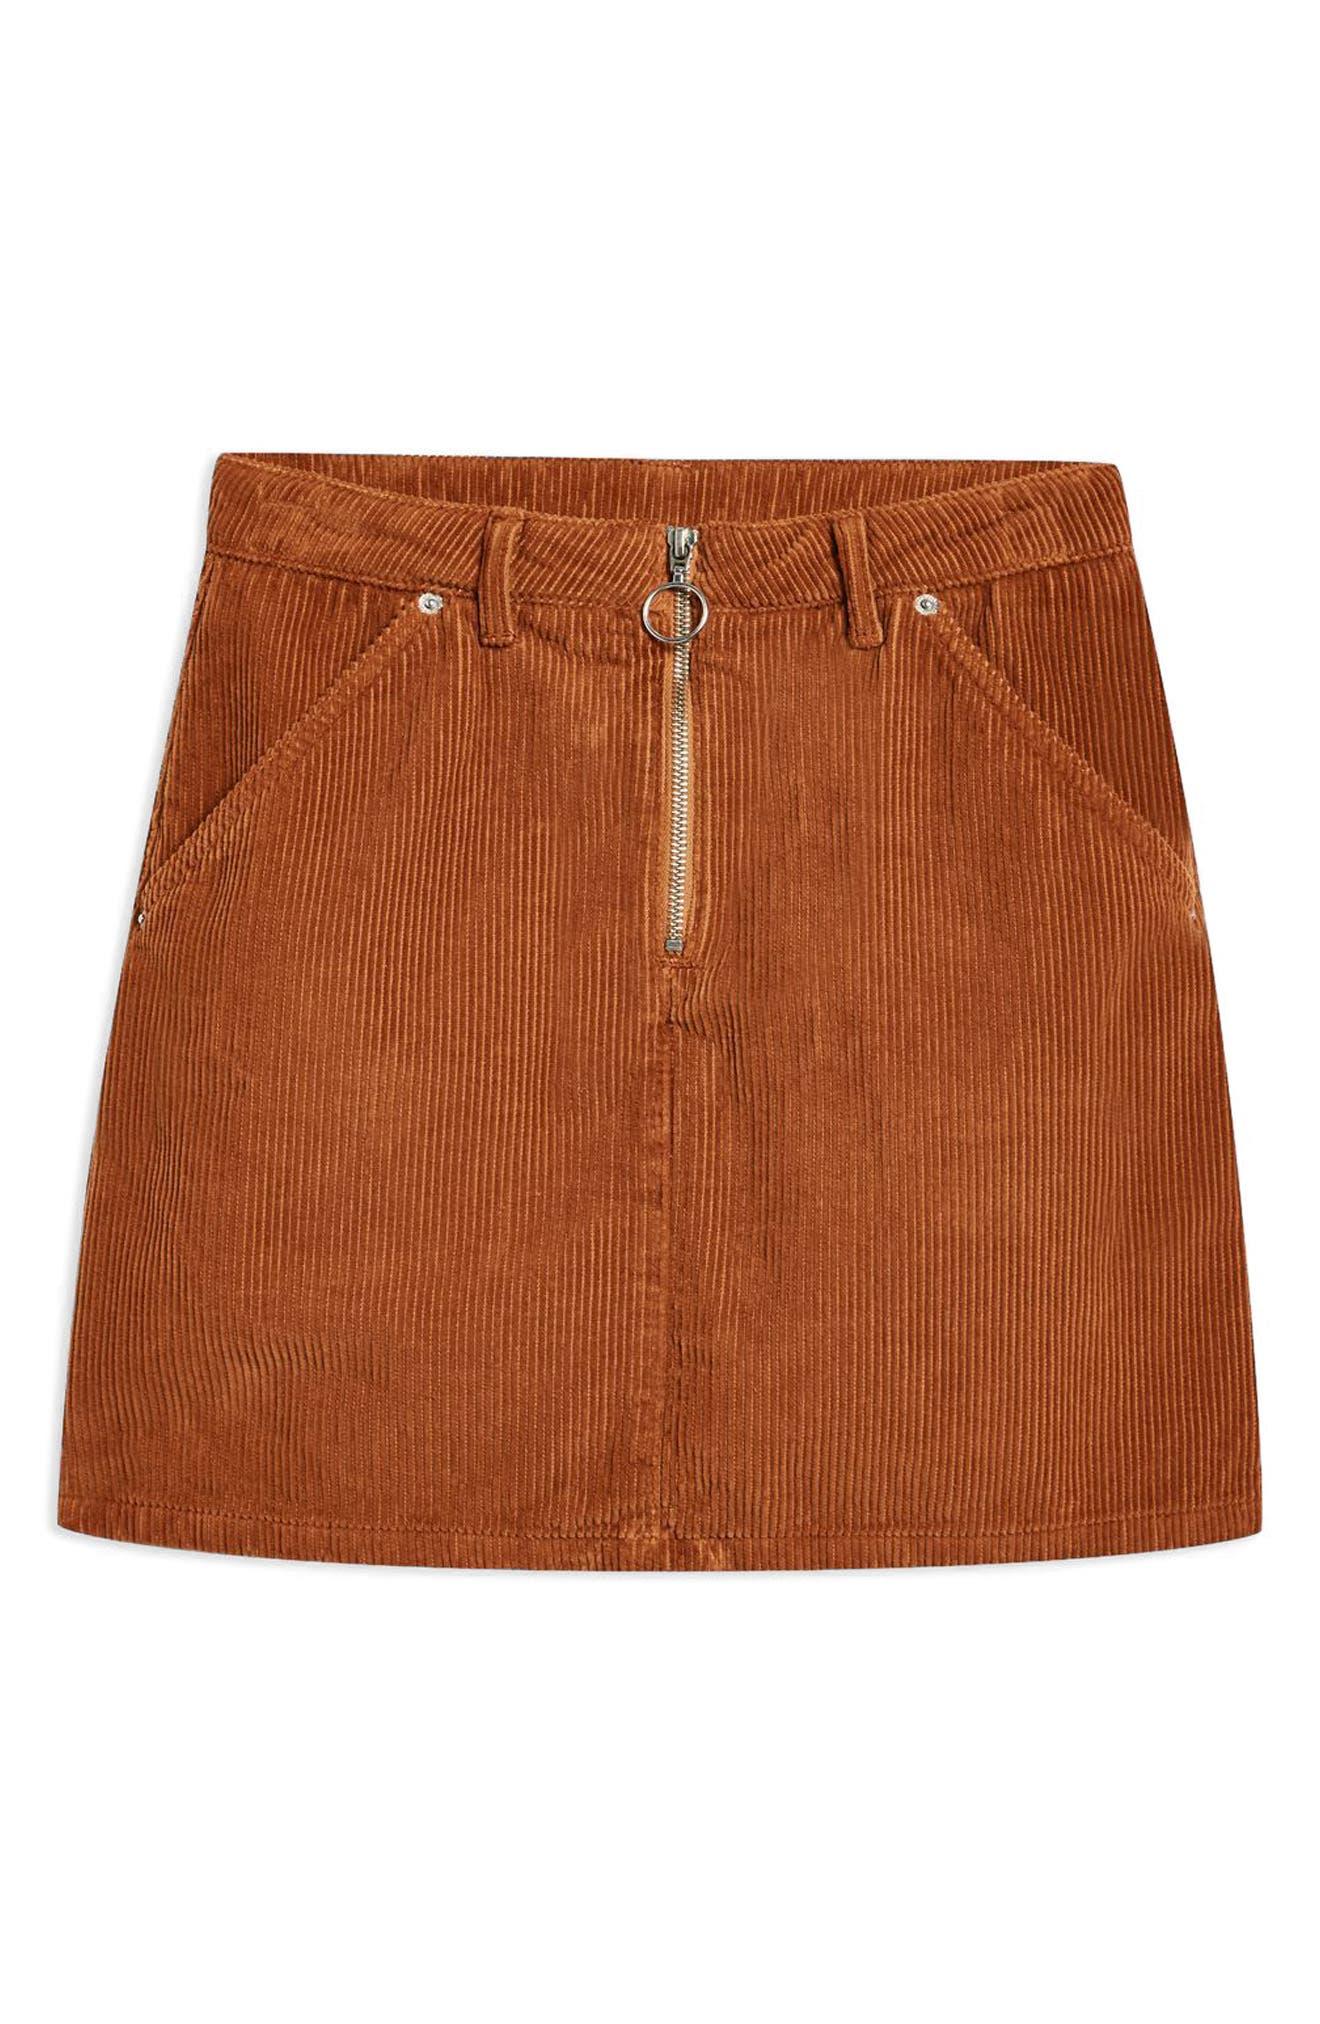 Cord Miniskirt,                             Alternate thumbnail 6, color,                             TOBACCO